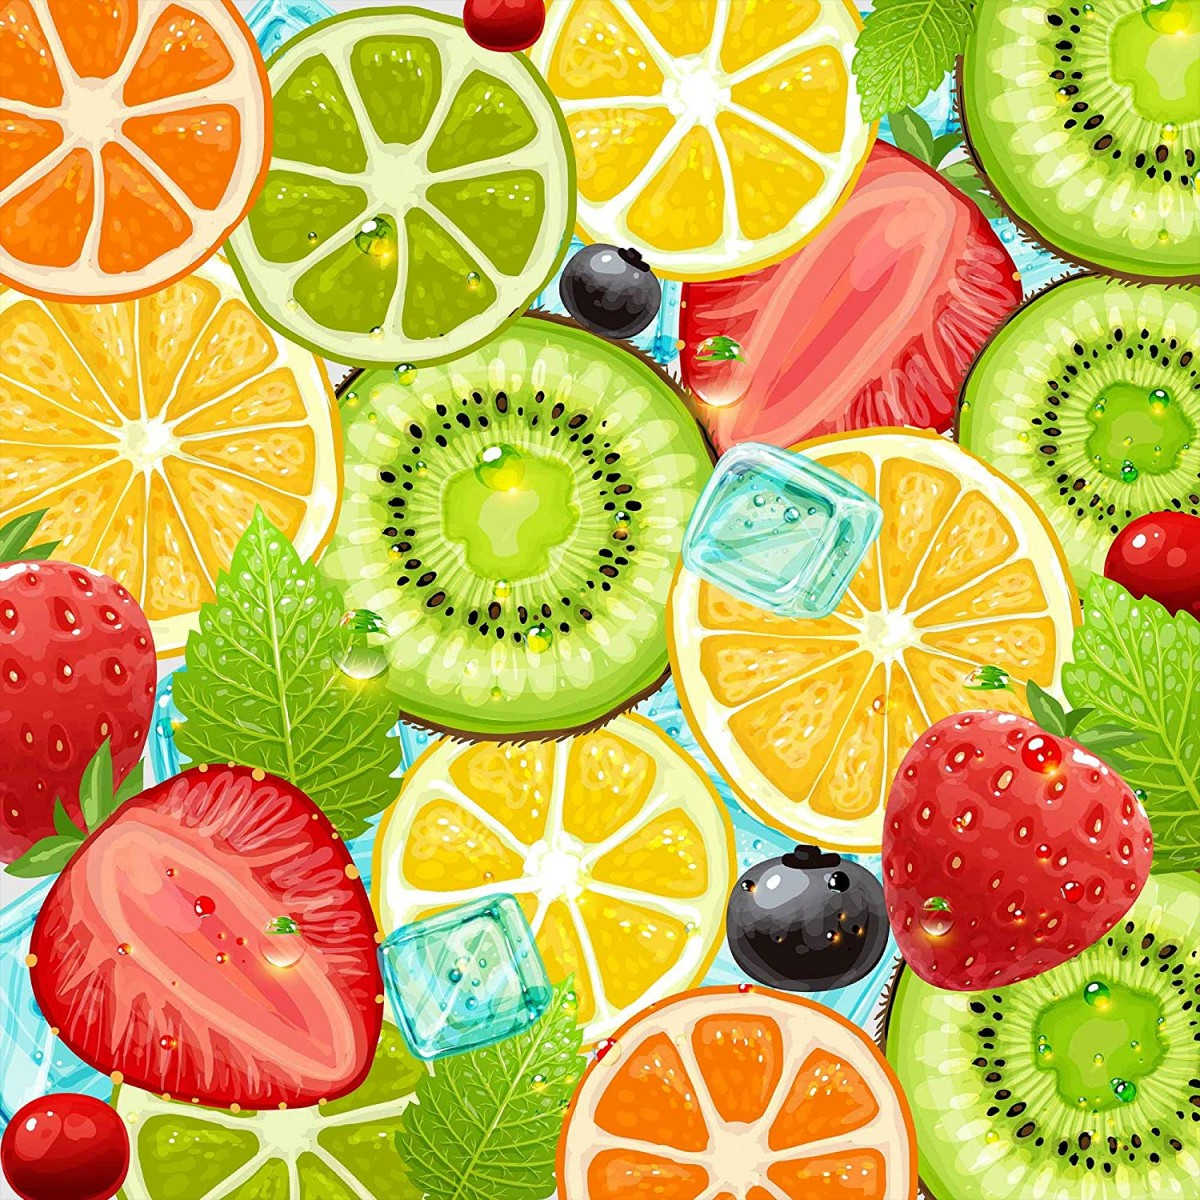 Puzzle Sammeln Puzzle Online - Citrus fruits and strawberries